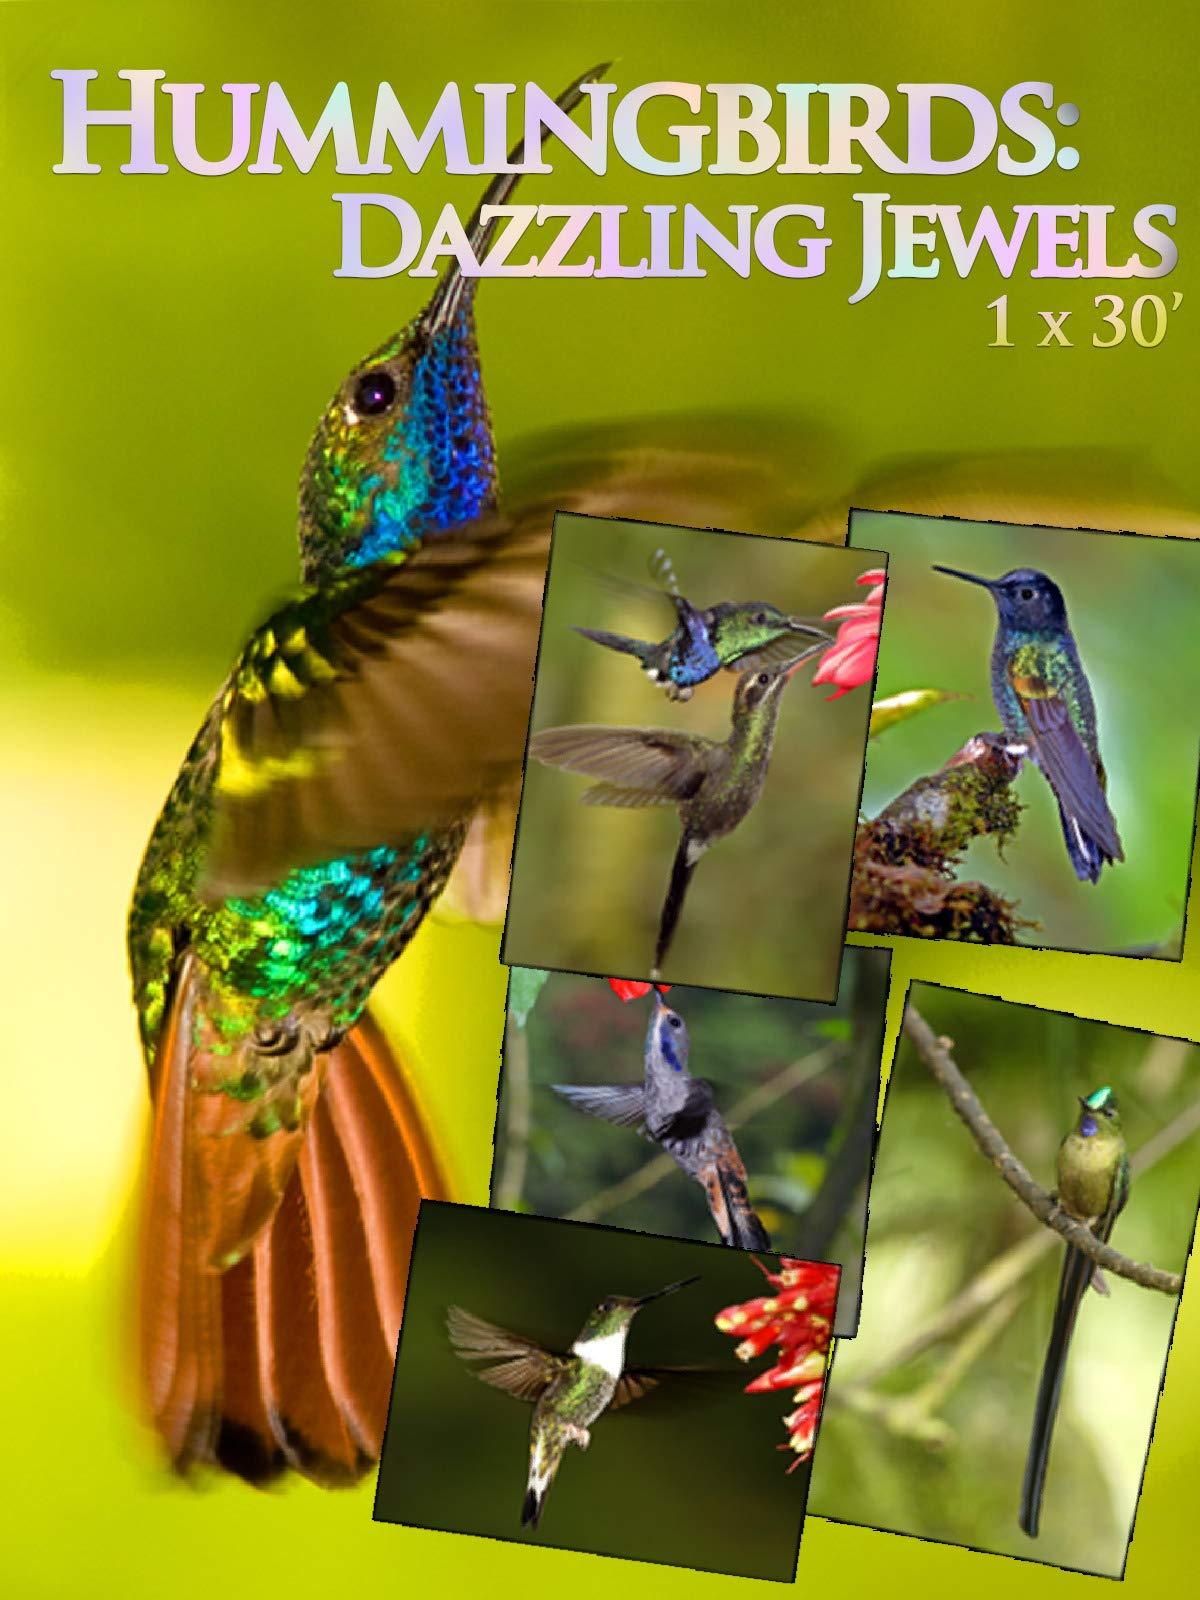 Hummingbirds: Dazzling Jewels on Amazon Prime Instant Video UK